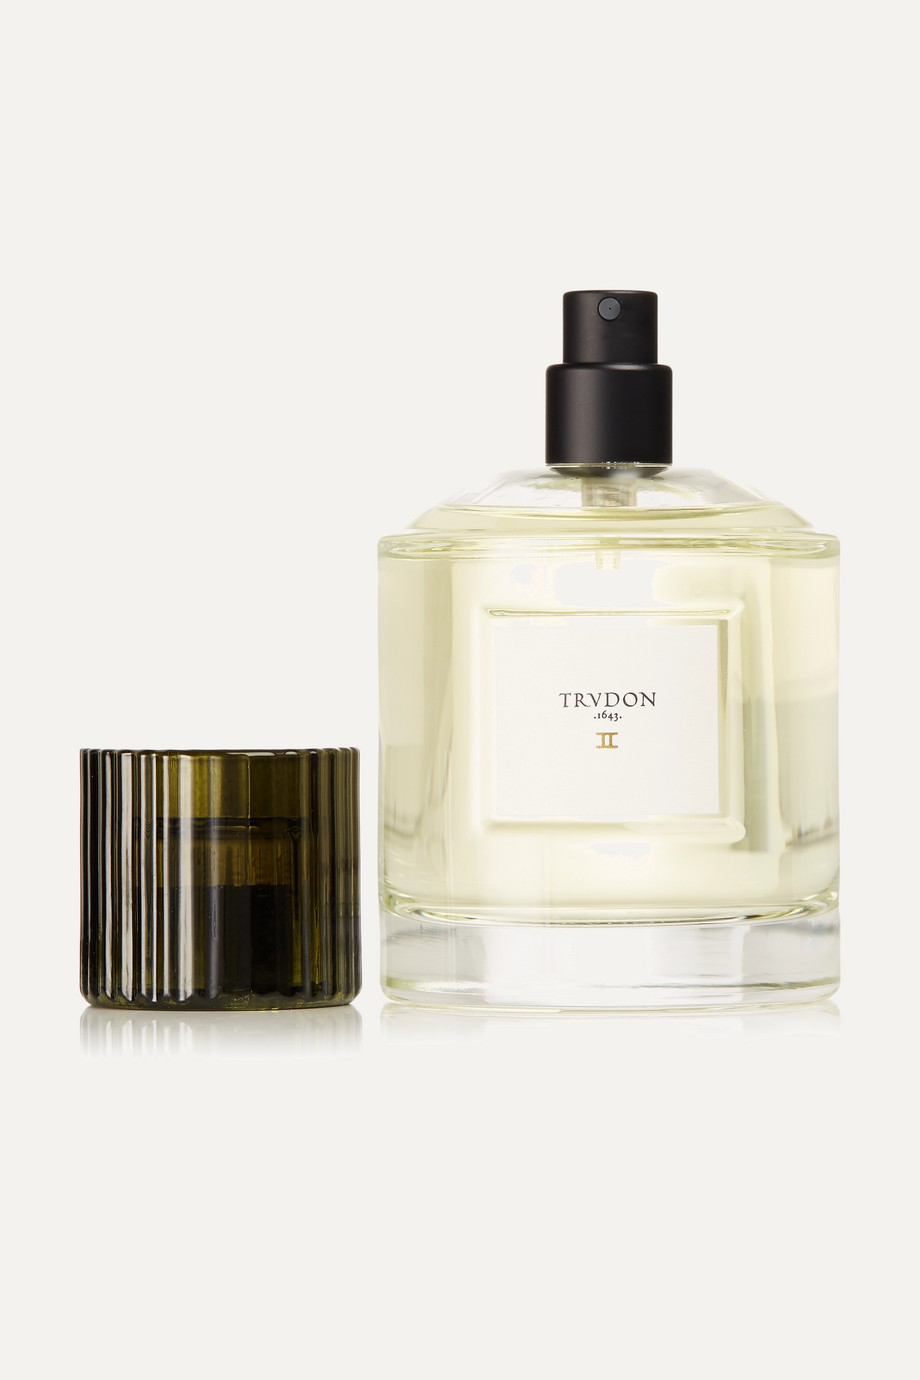 Cire Trudon II, 100 ml – Eau de Parfum